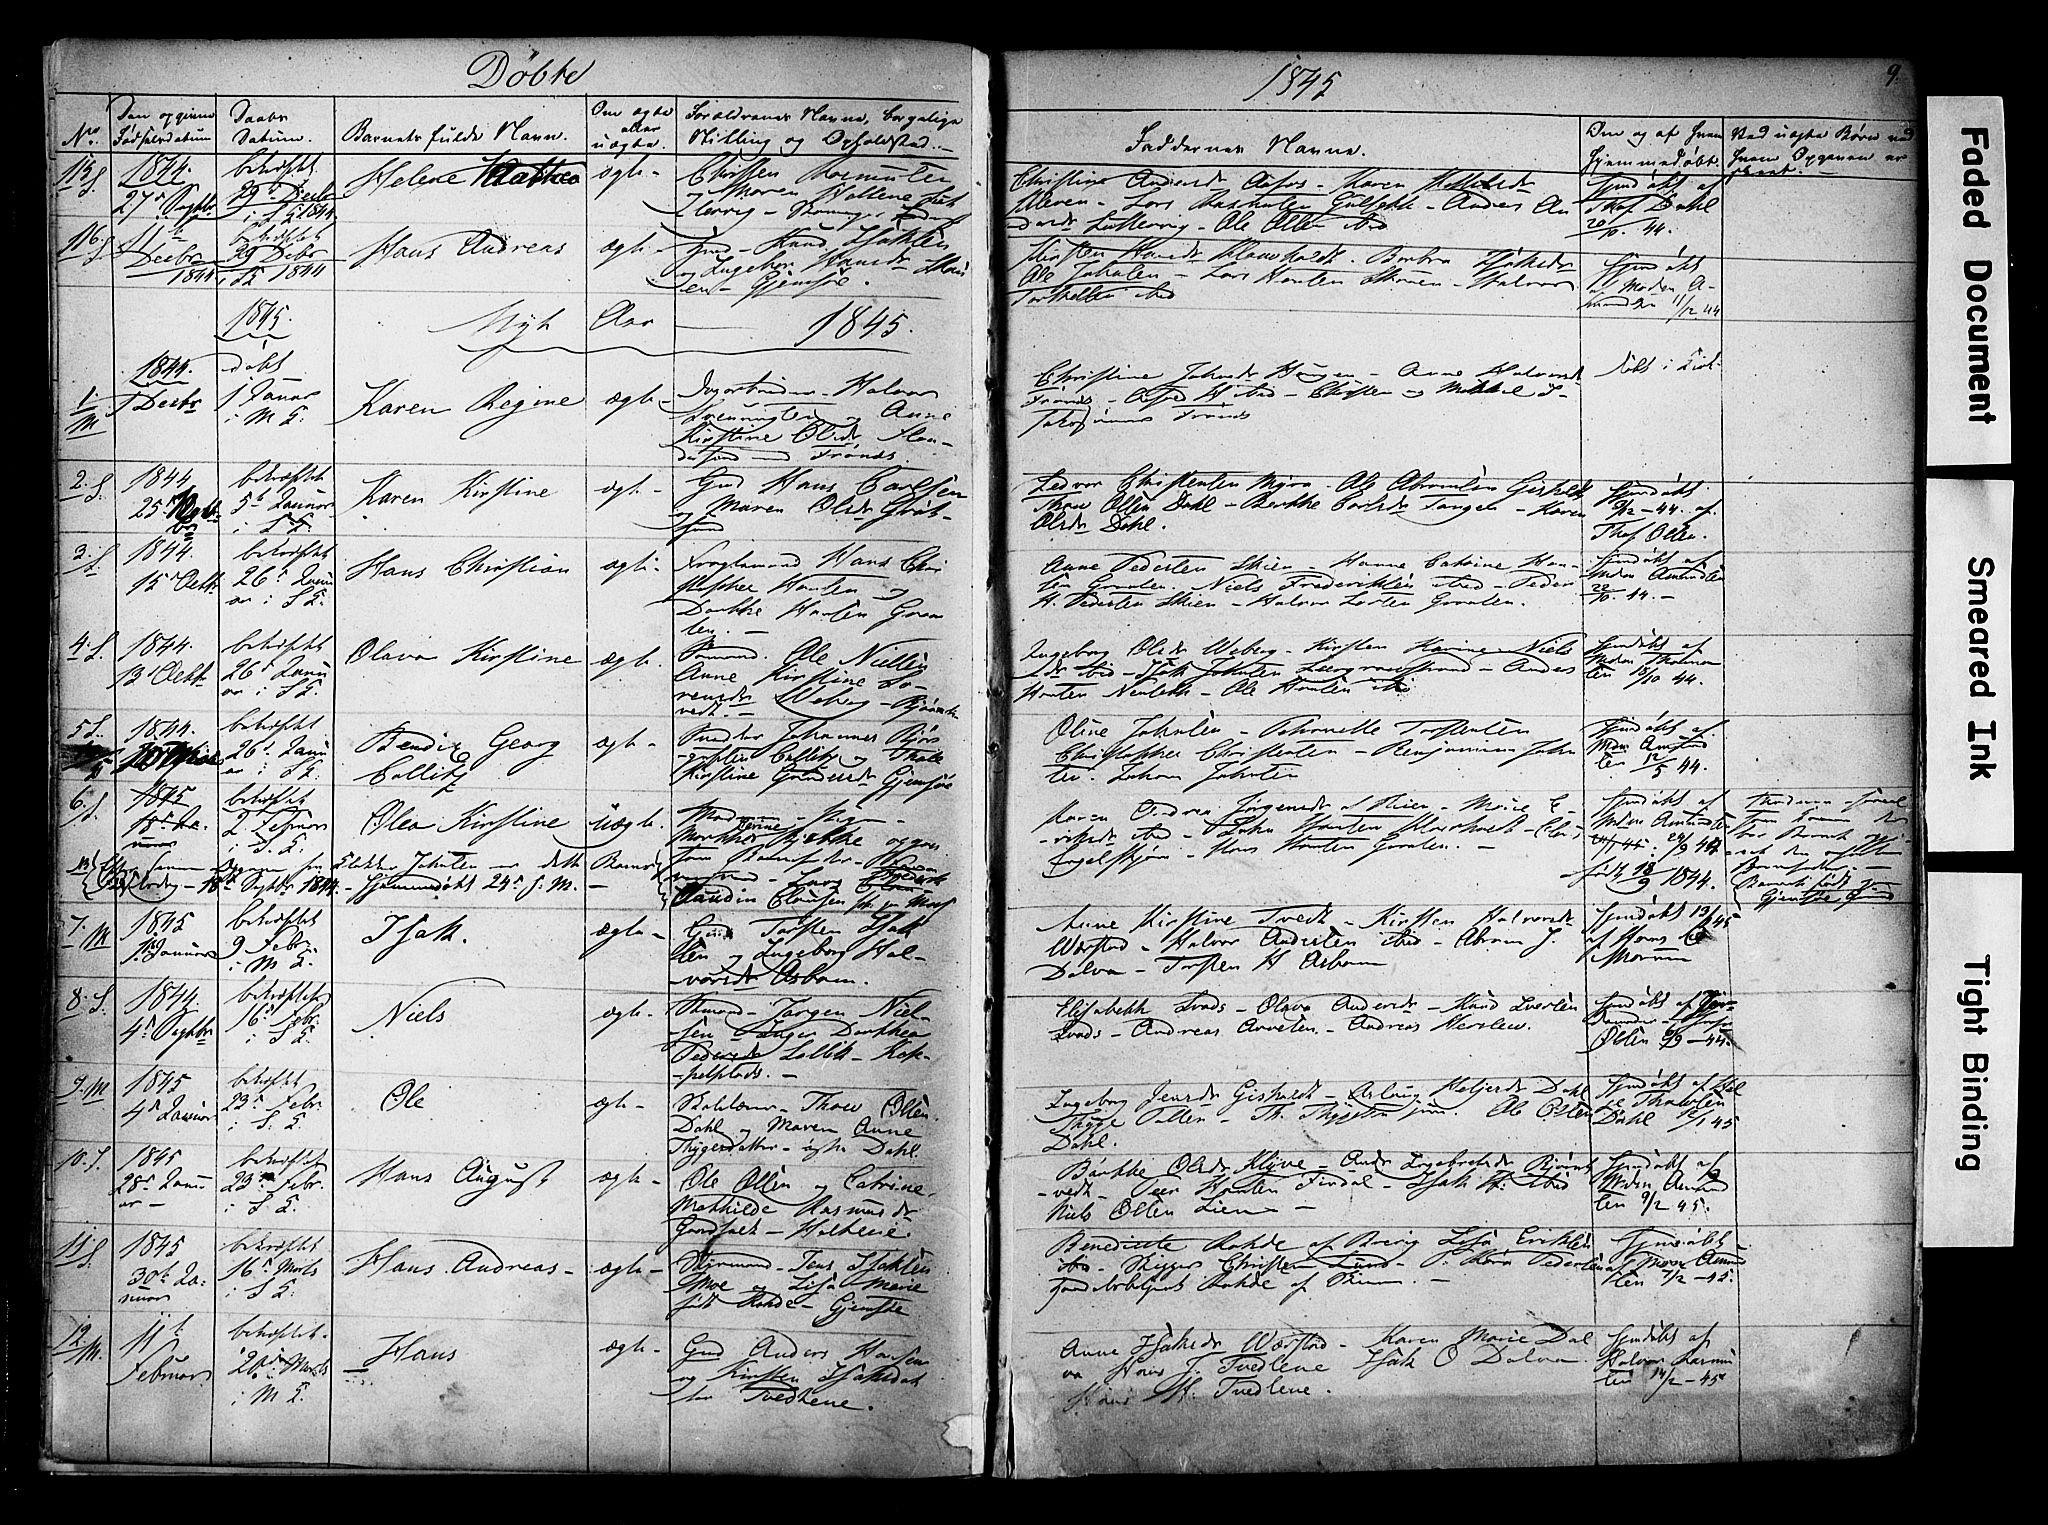 SAKO, Solum kirkebøker, F/Fa/L0006: Ministerialbok nr. I 6, 1844-1855, s. 9